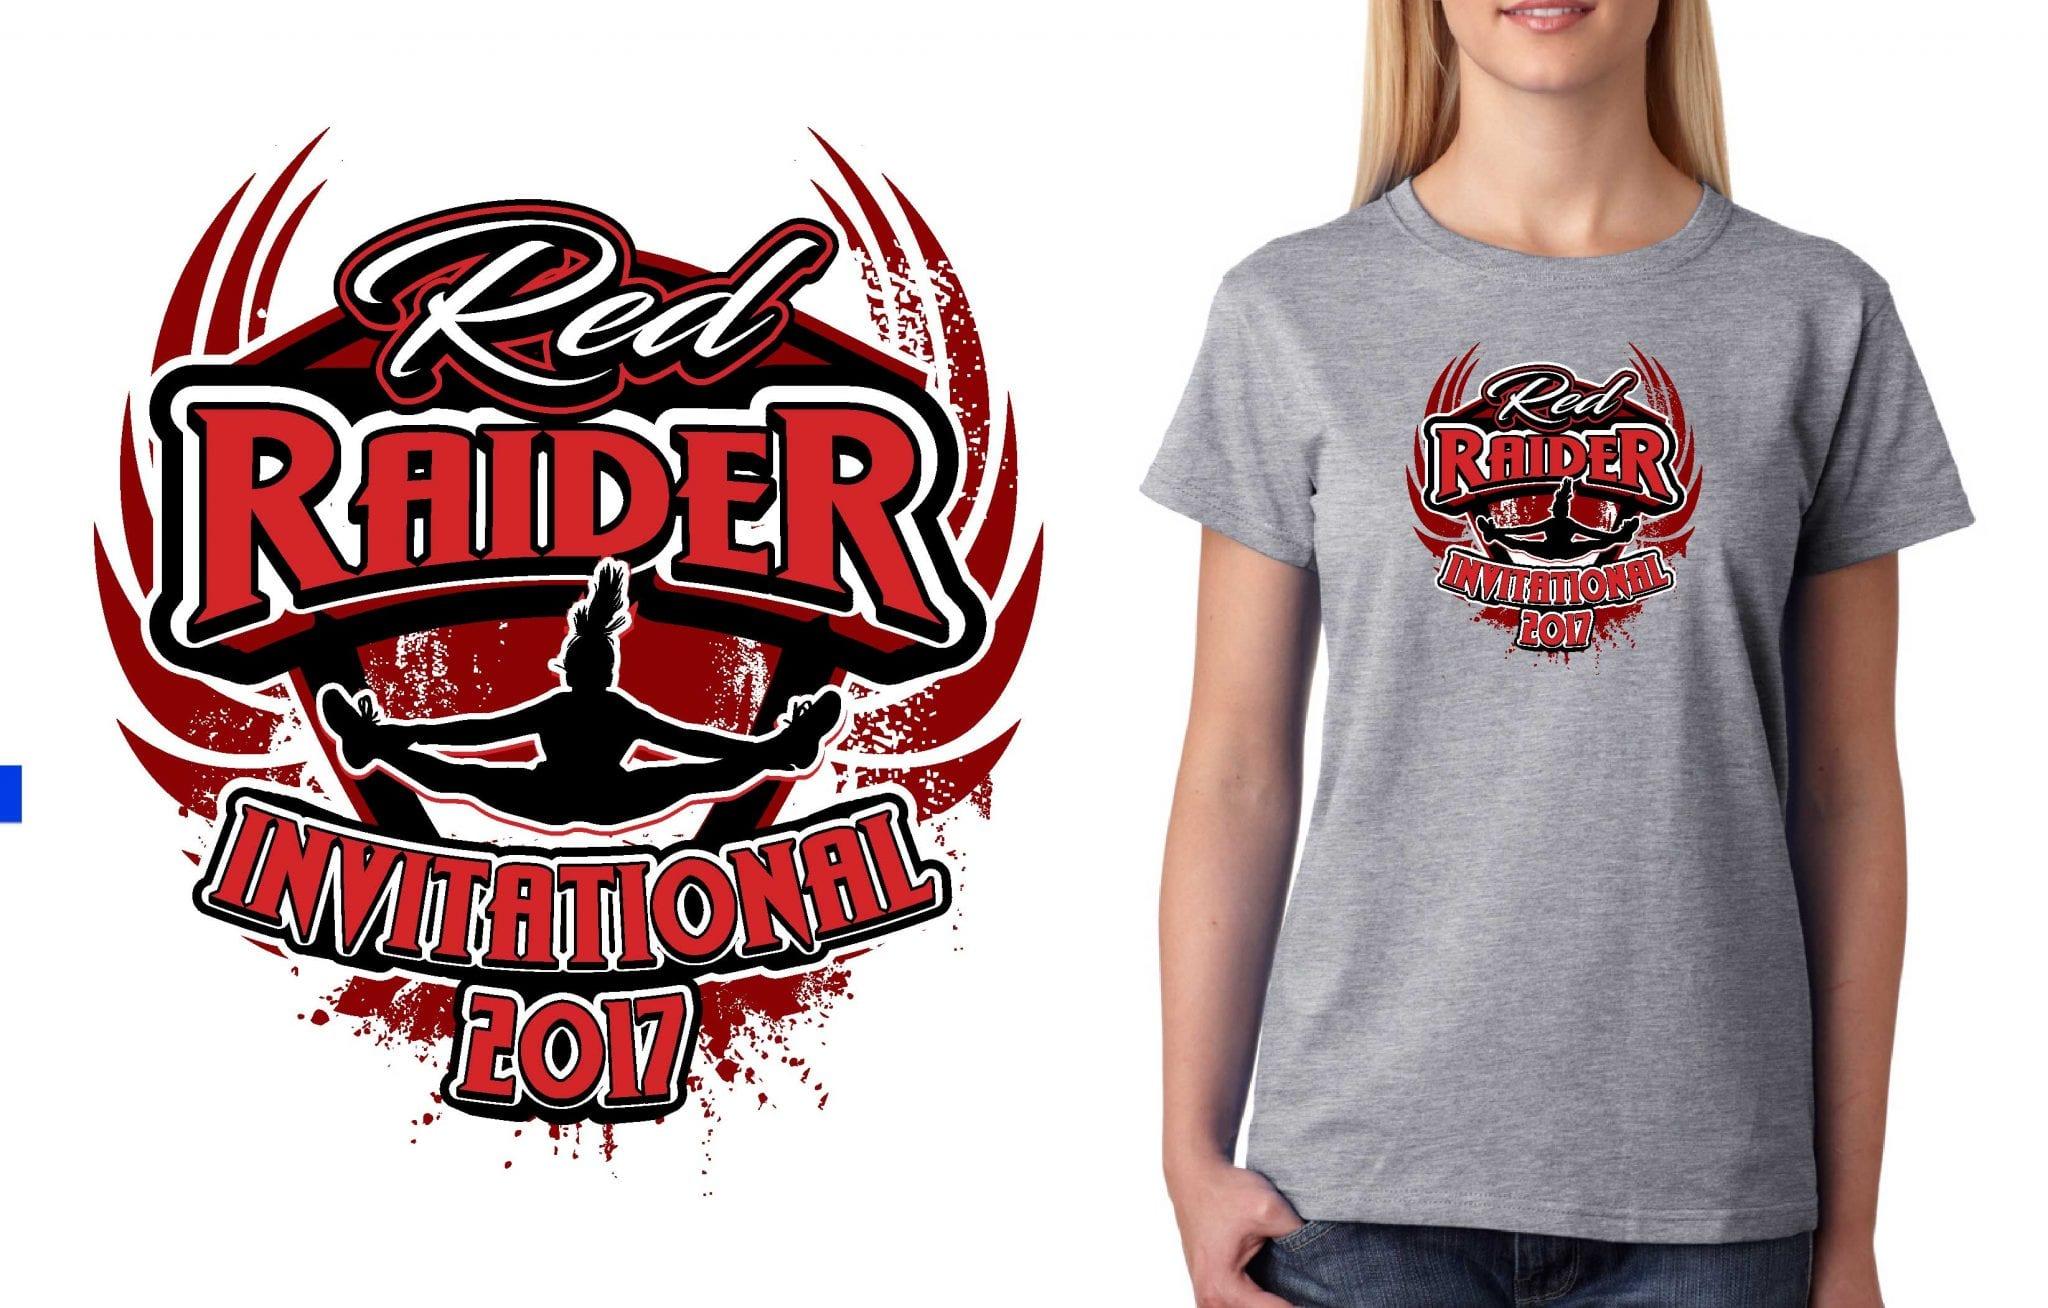 2017 Red Raider Invitational vector logo design for cheer t-shirt UrArtStudio